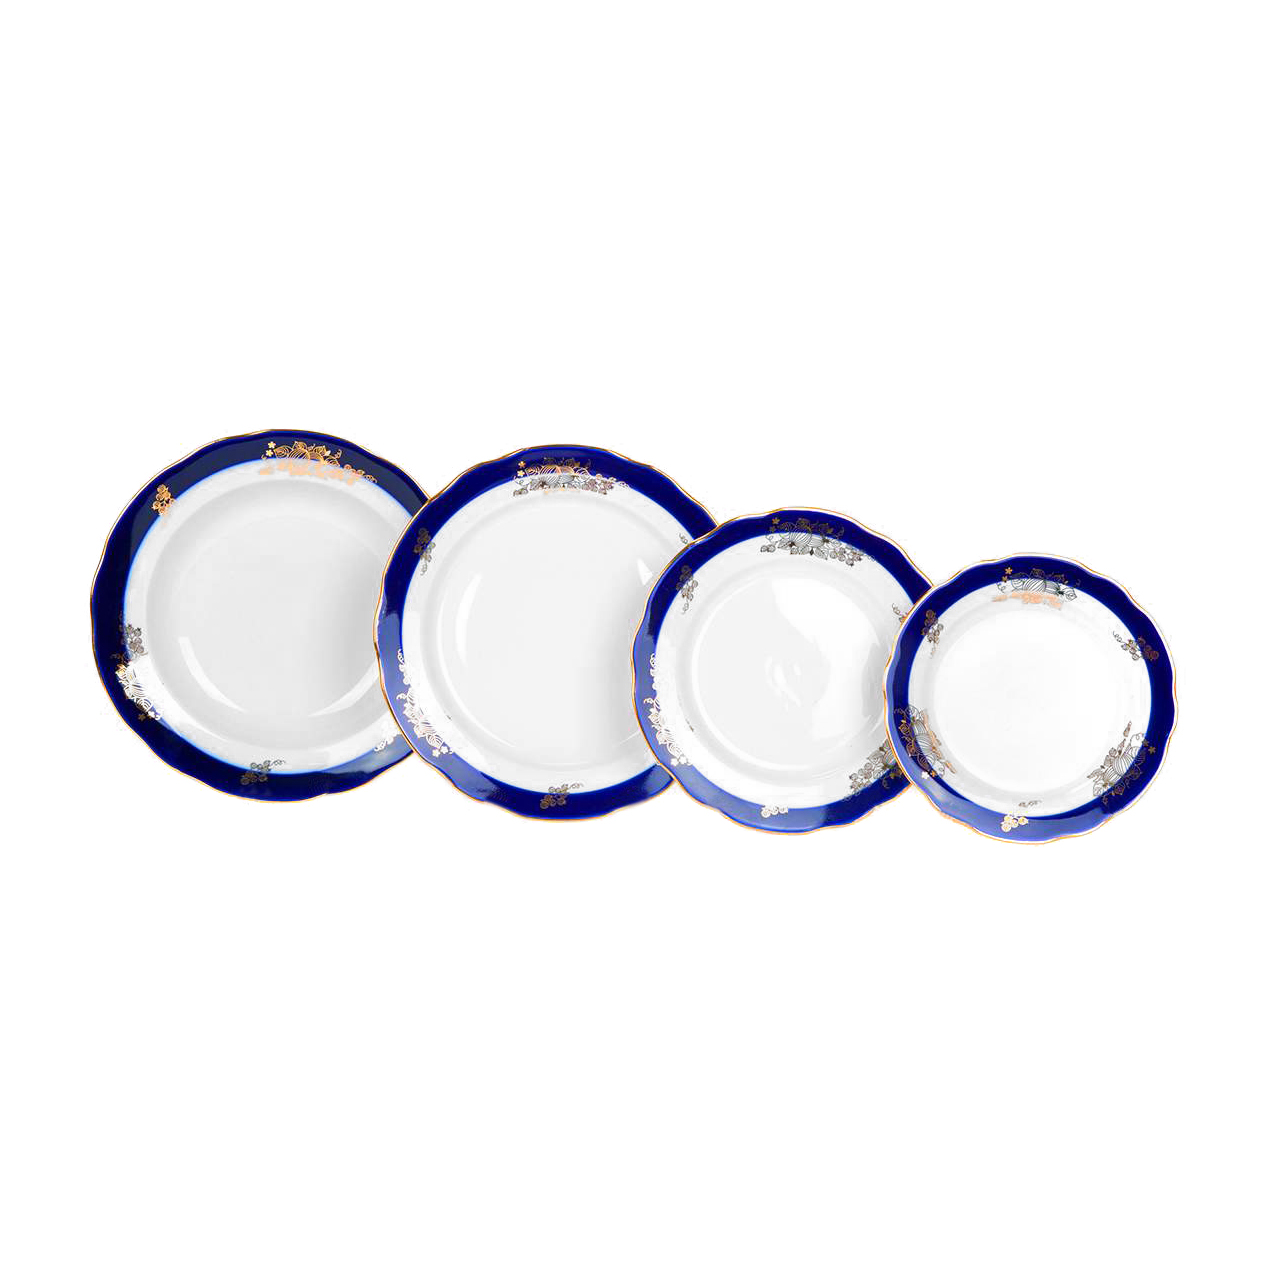 Набор тарелок Дулево Ягоды 6 персон 24 предмета